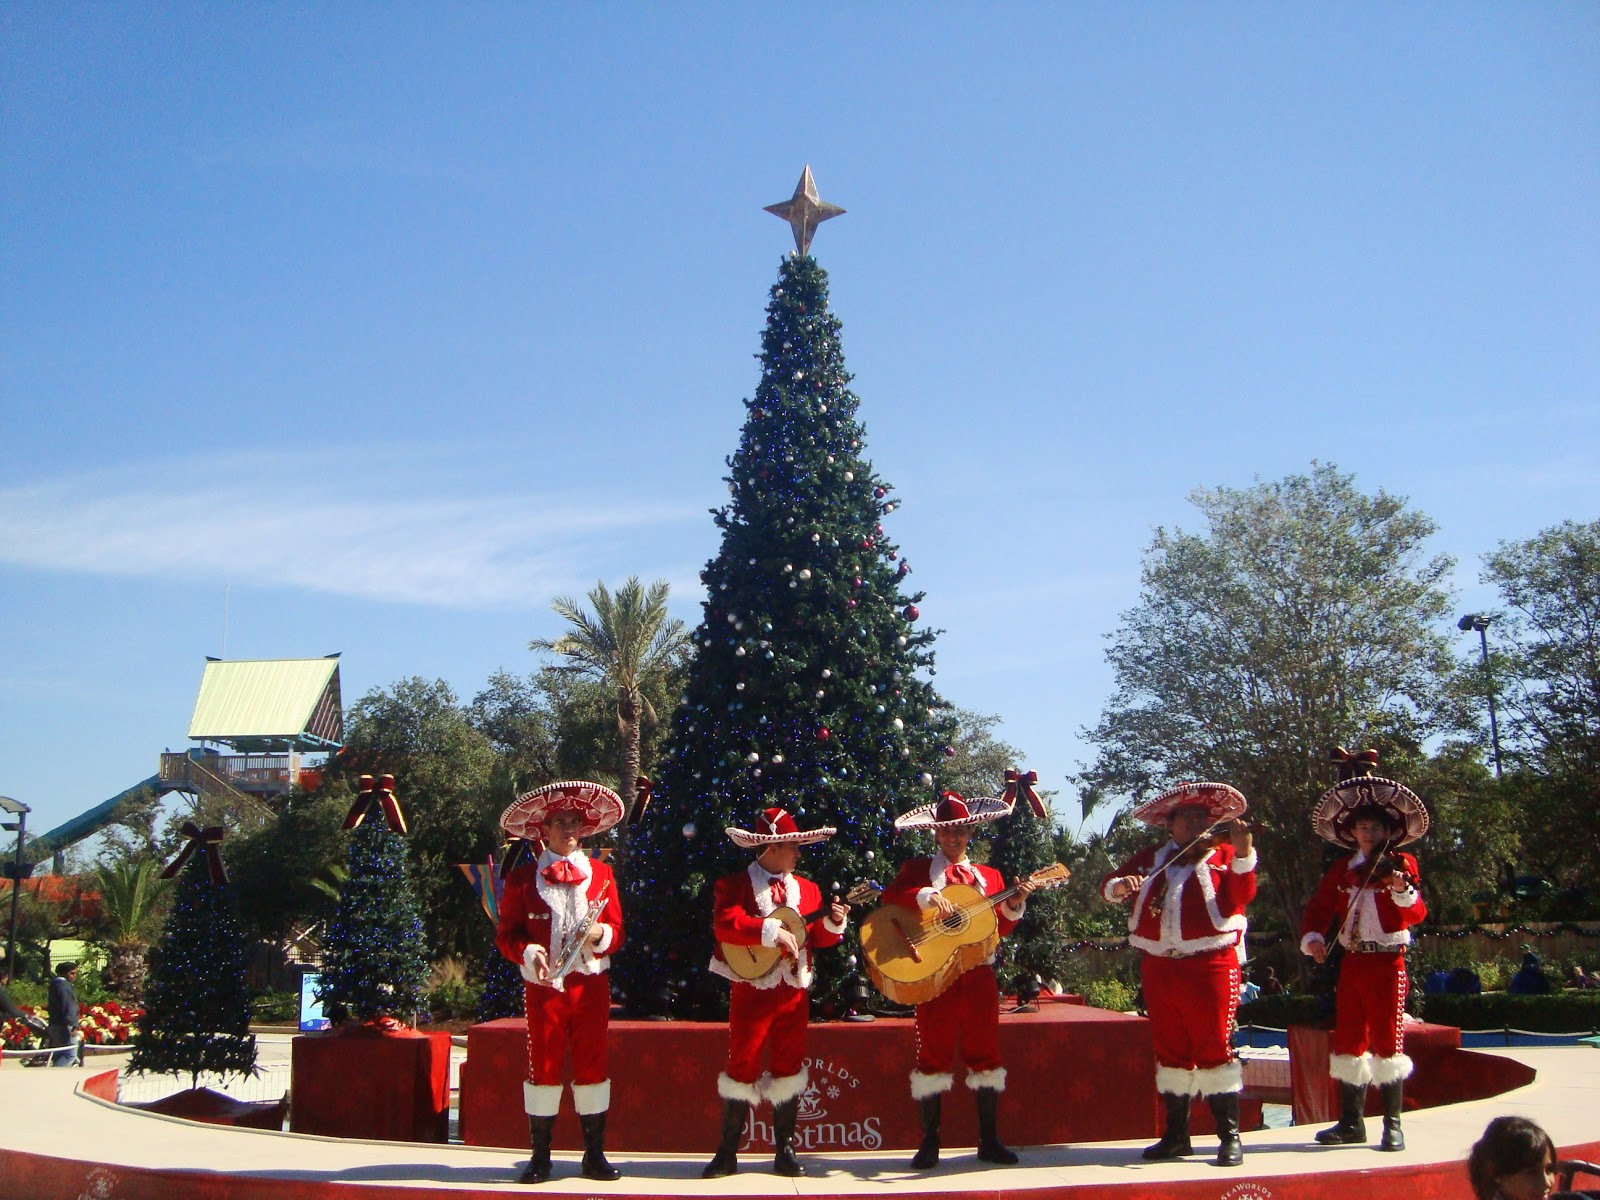 There U0026 39 S Magic Out There  Seaworld San Antonio Christmas